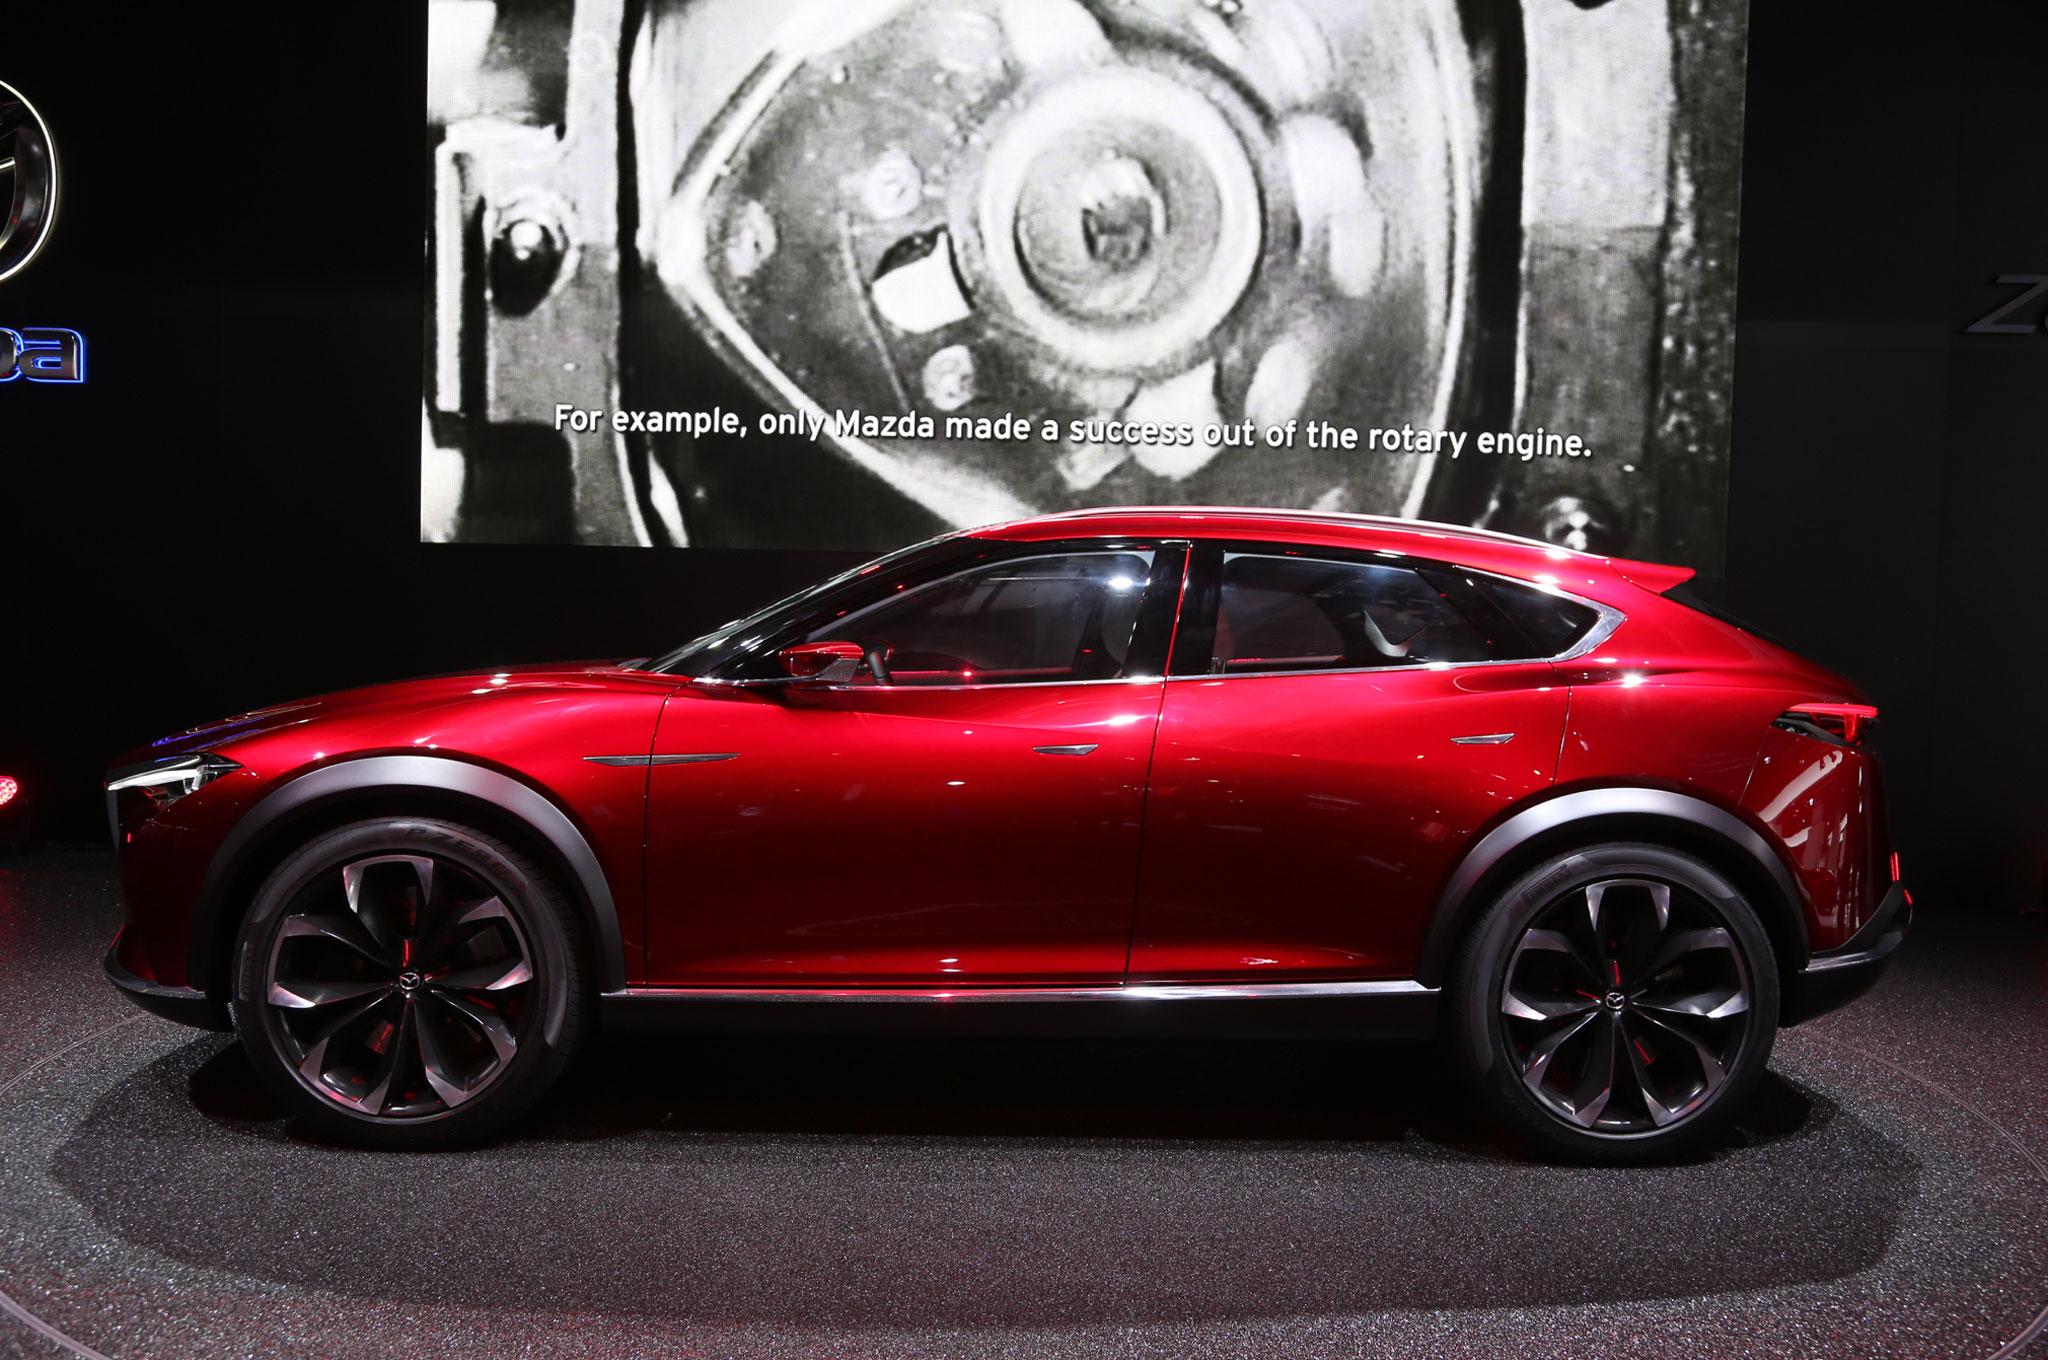 http://st.automobilemag.com/uploads/sites/11/2015/09/Mazda-Koeru-Concept-side-profile.jpg